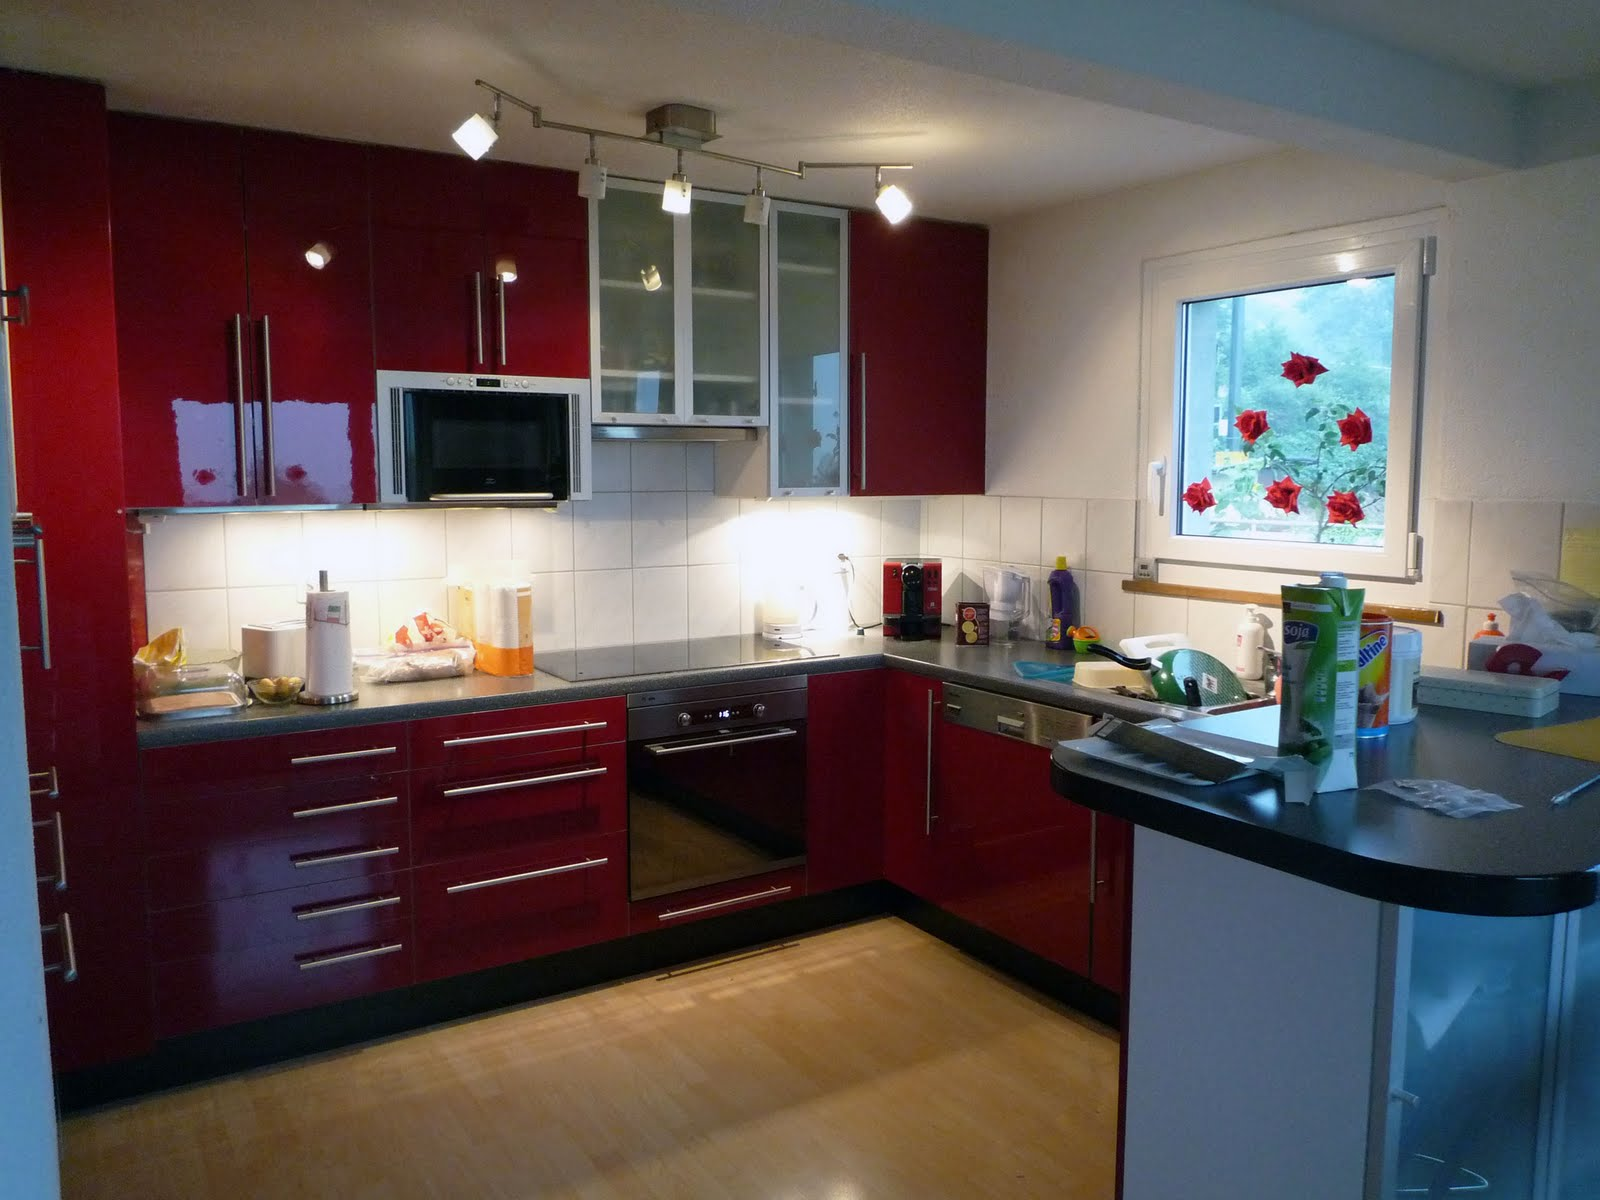 Muebles de cocina baratos tipos de muebles para cocina - Cocinas modernas ikea ...